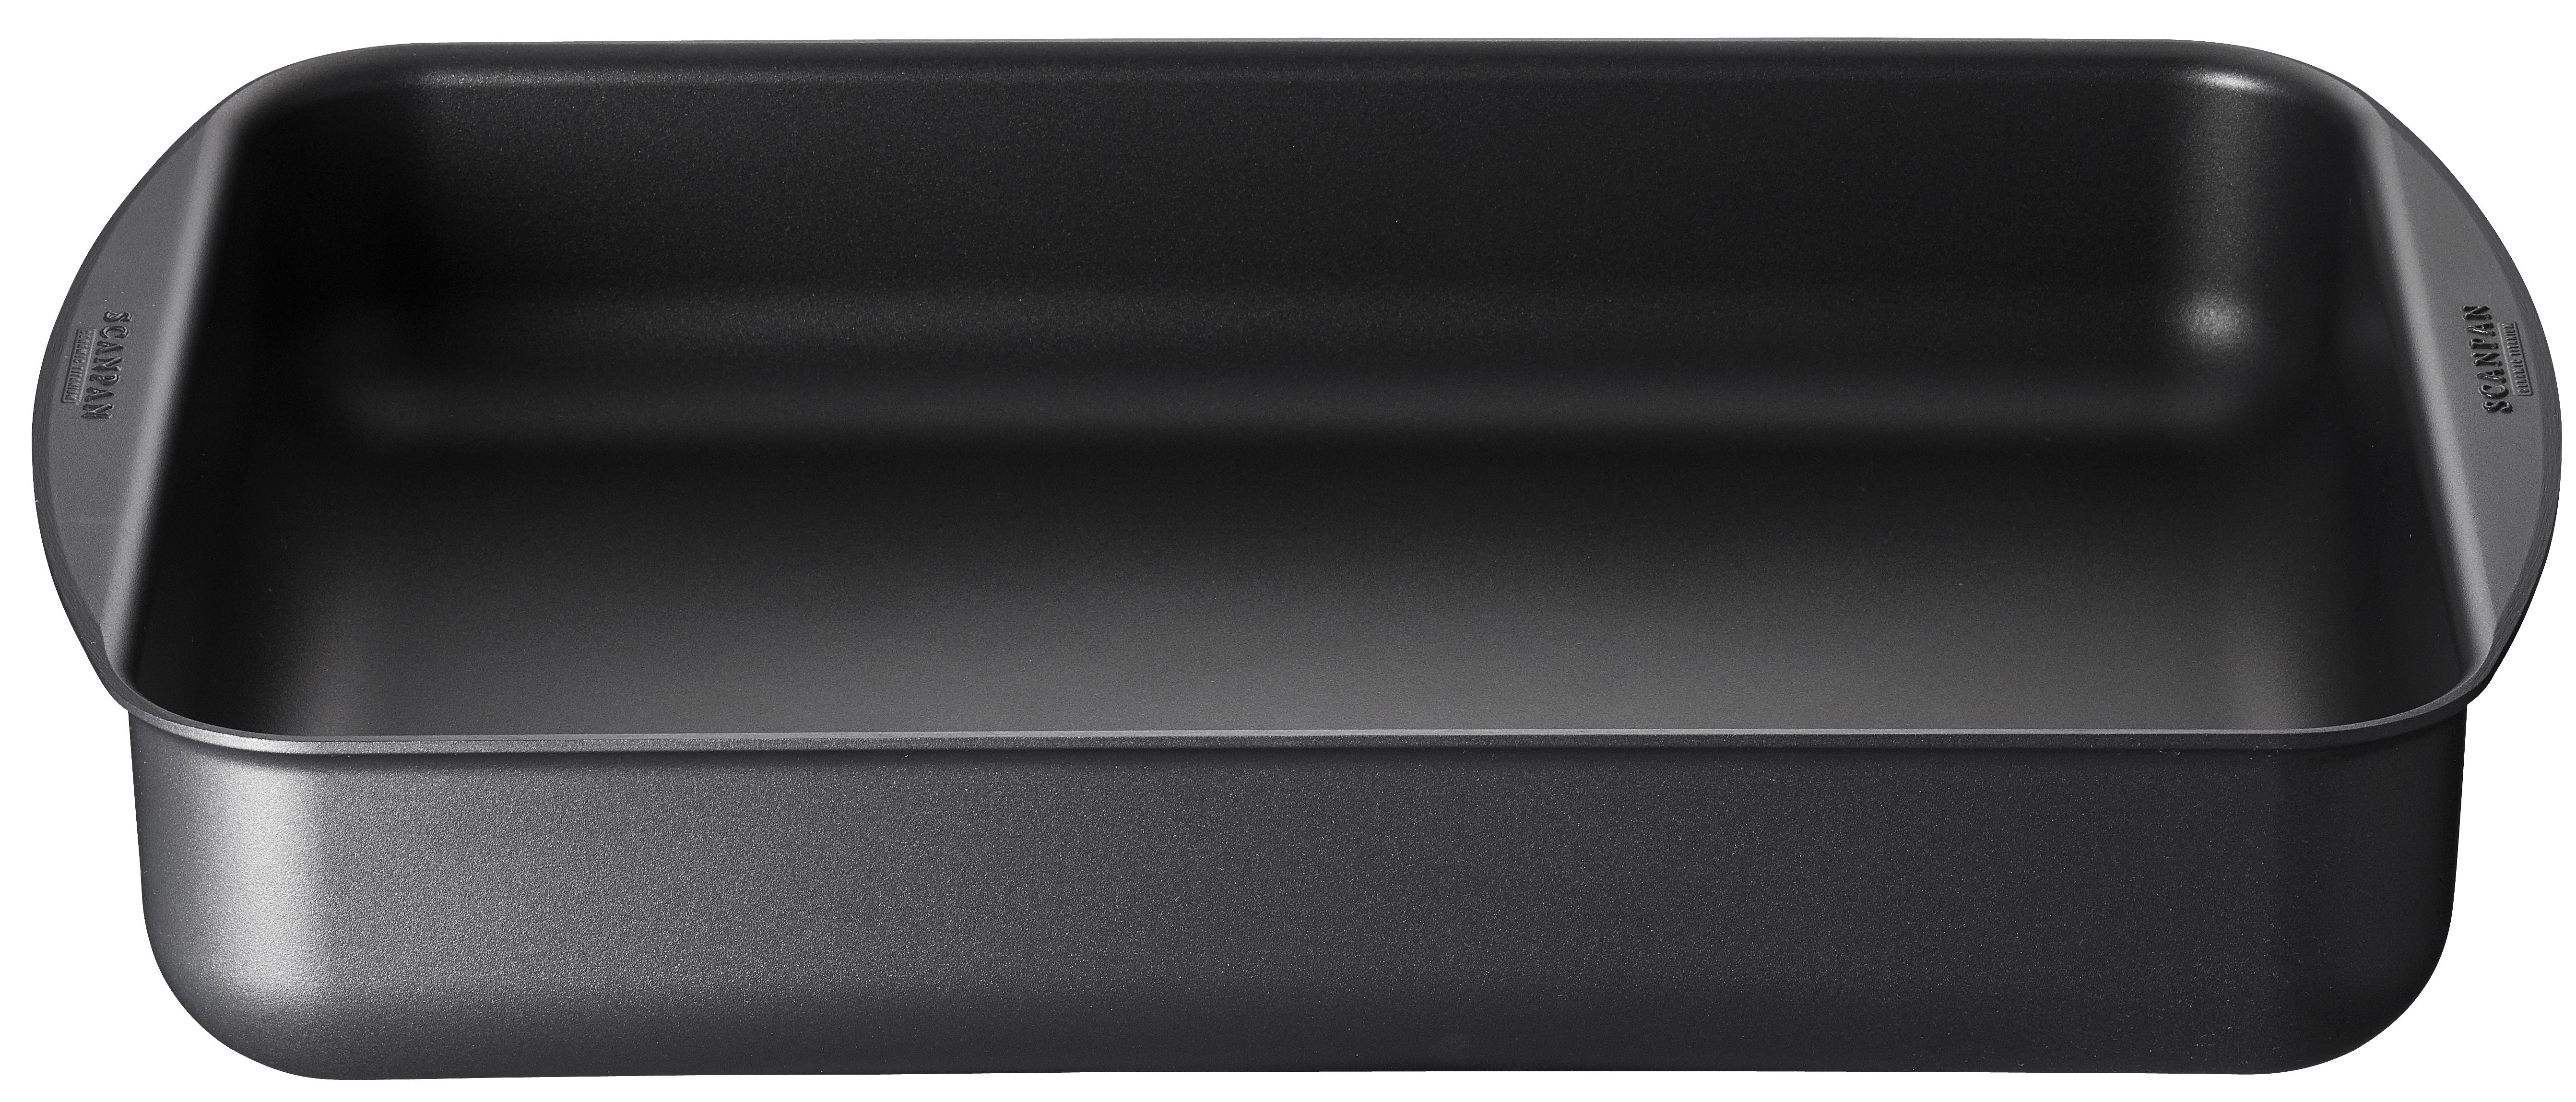 7,75 l/44x32 cm Bradepande - Classic, 7,75 l 44 x 32 cm